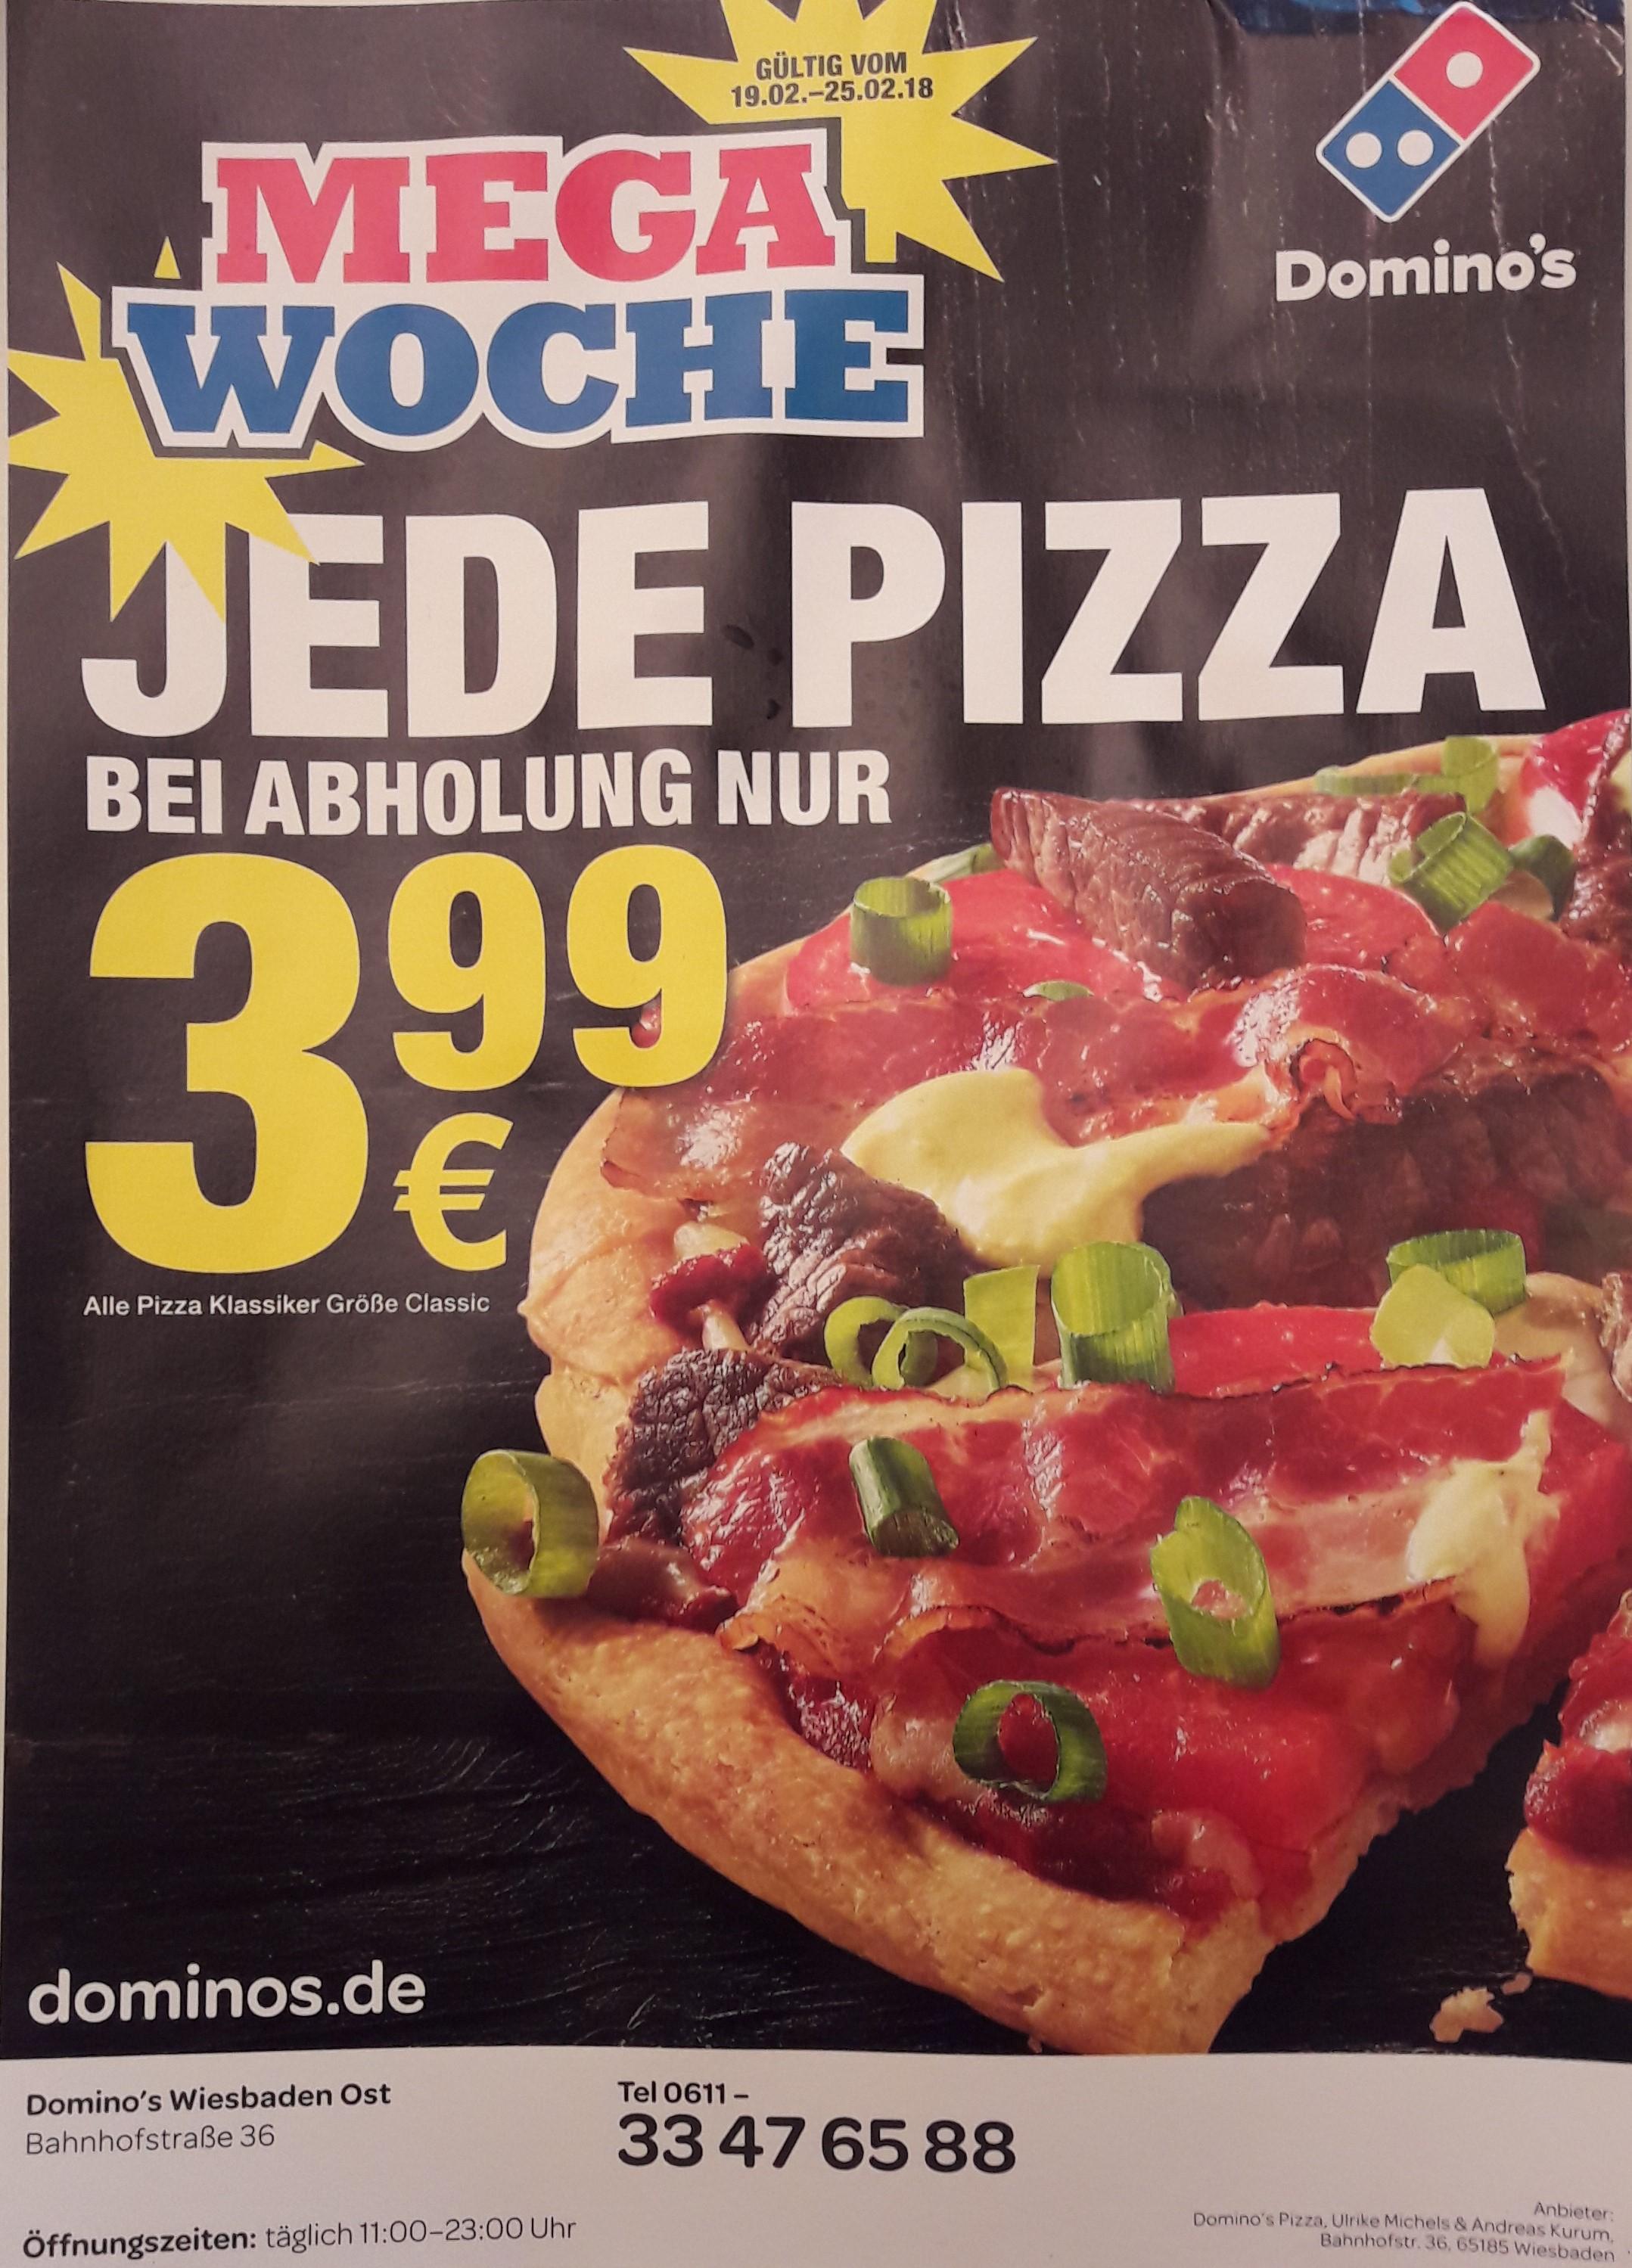 Domino's: MEGA WOCHE Jede Pizza bei Abholung 3,99 € (Größe Classic) (bundesweit)